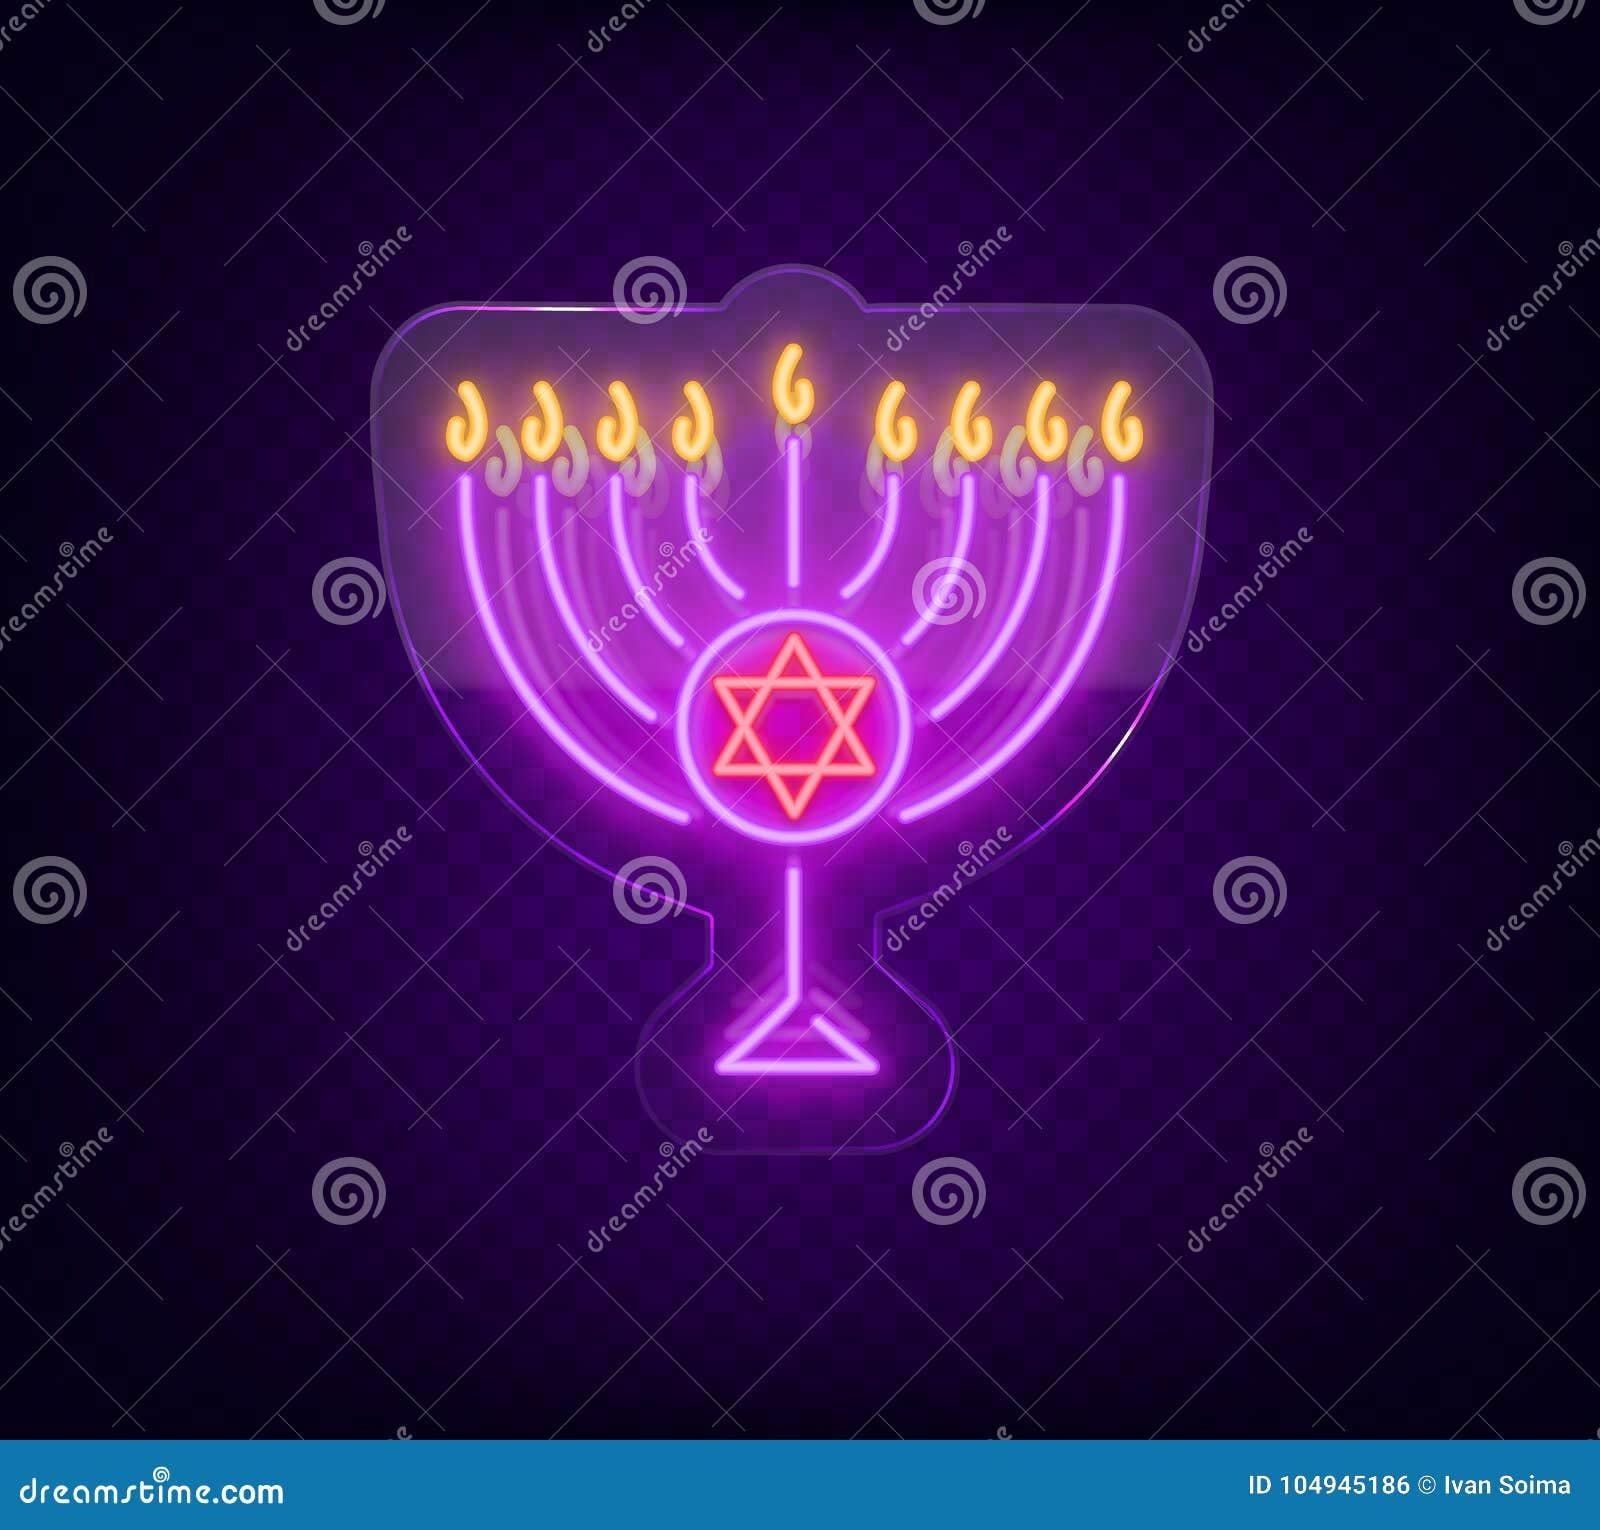 Chanukah vector design happy hanukkah neon sign bright luminous download chanukah vector design happy hanukkah neon sign bright luminous banner for greetings m4hsunfo